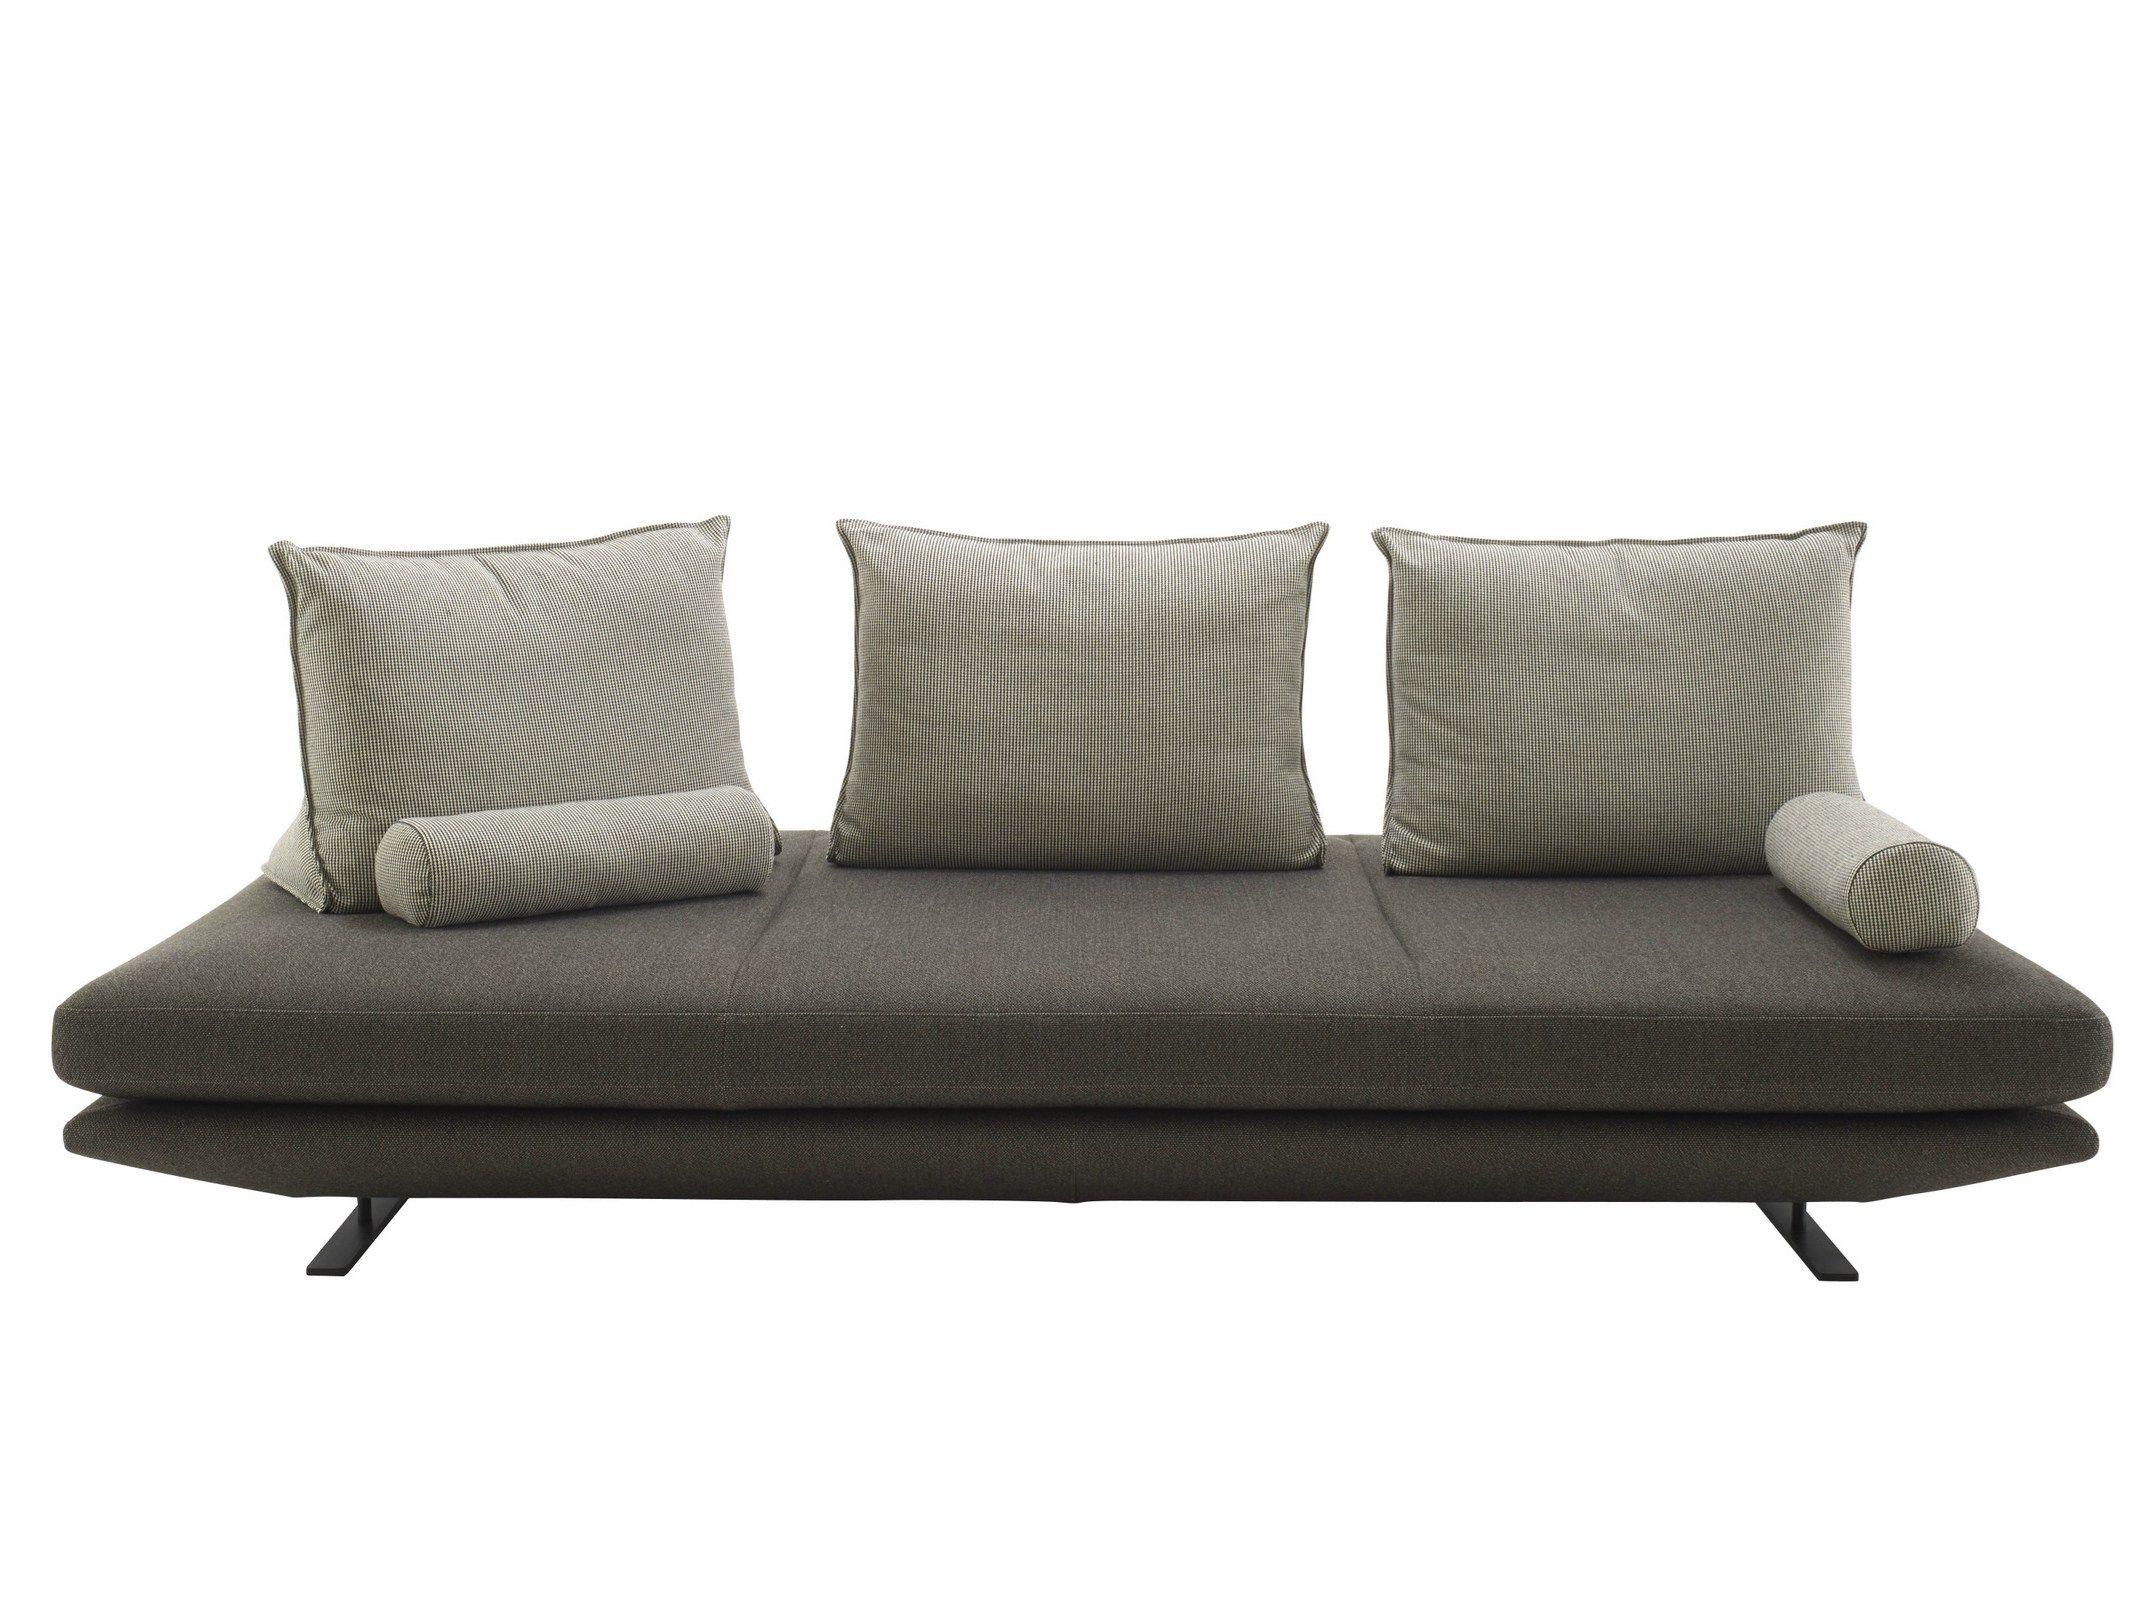 Gepolsterte Sitzbank aus Stoff PRADO by ROSET ITALIA Design ...